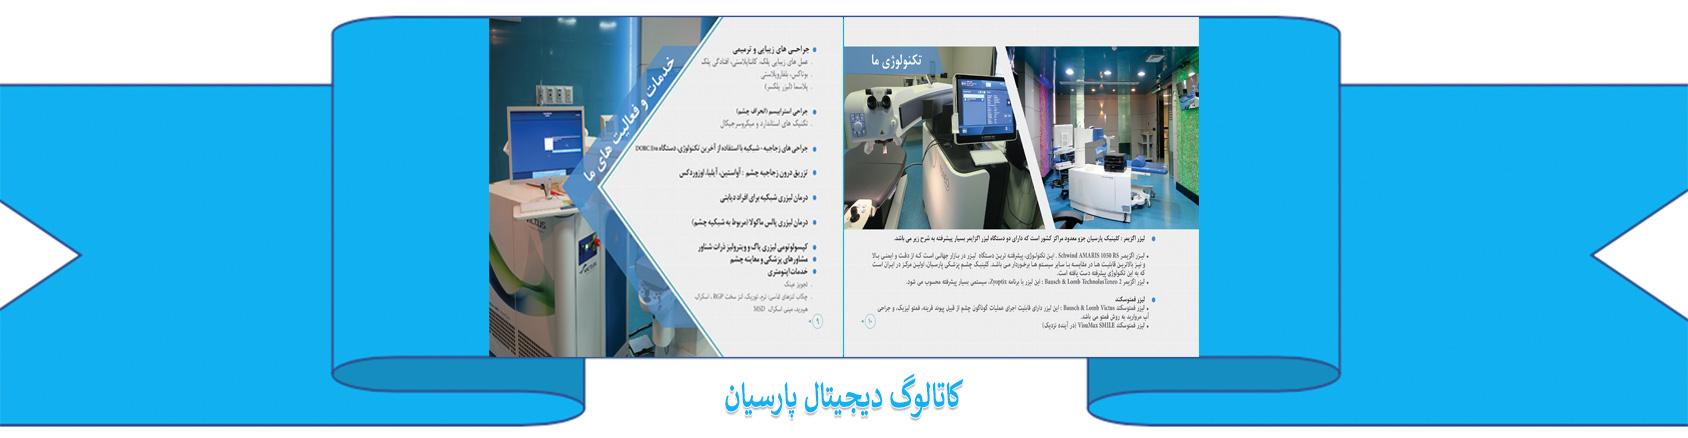 کاتالوگ فارسی چشم پزشکی پارسیان